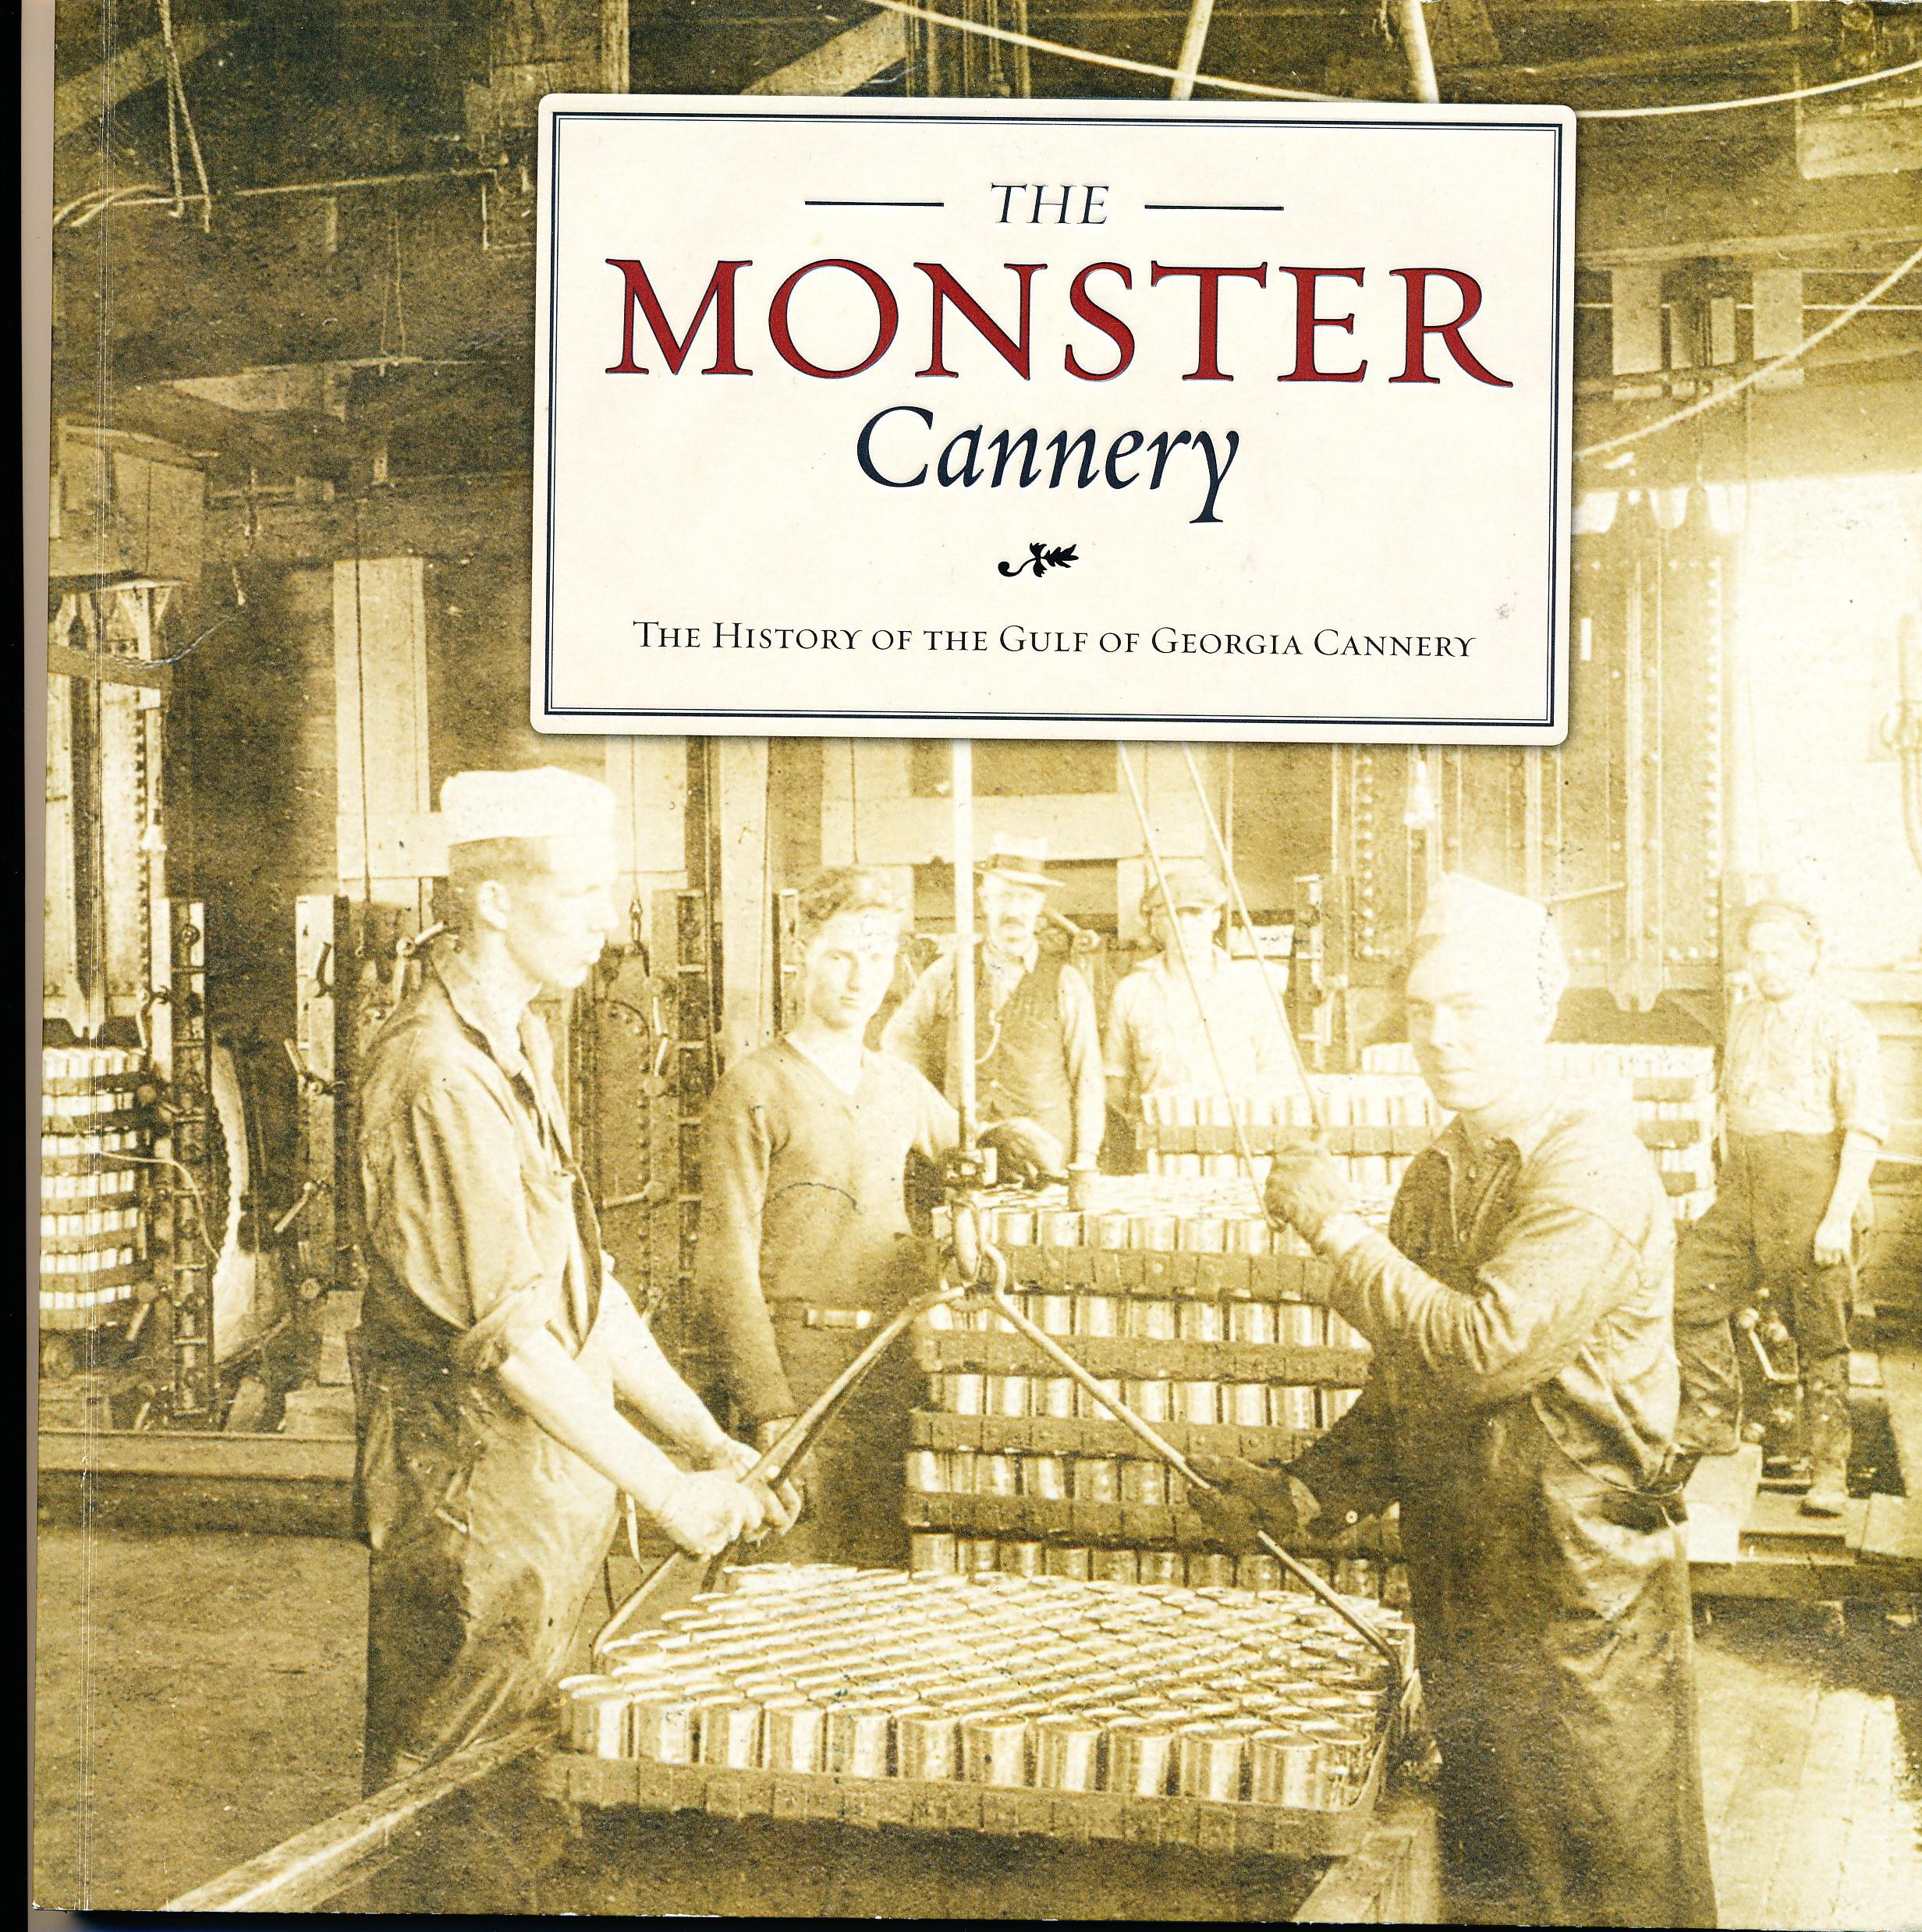 Food History Book Reviews - The British Columbia Food